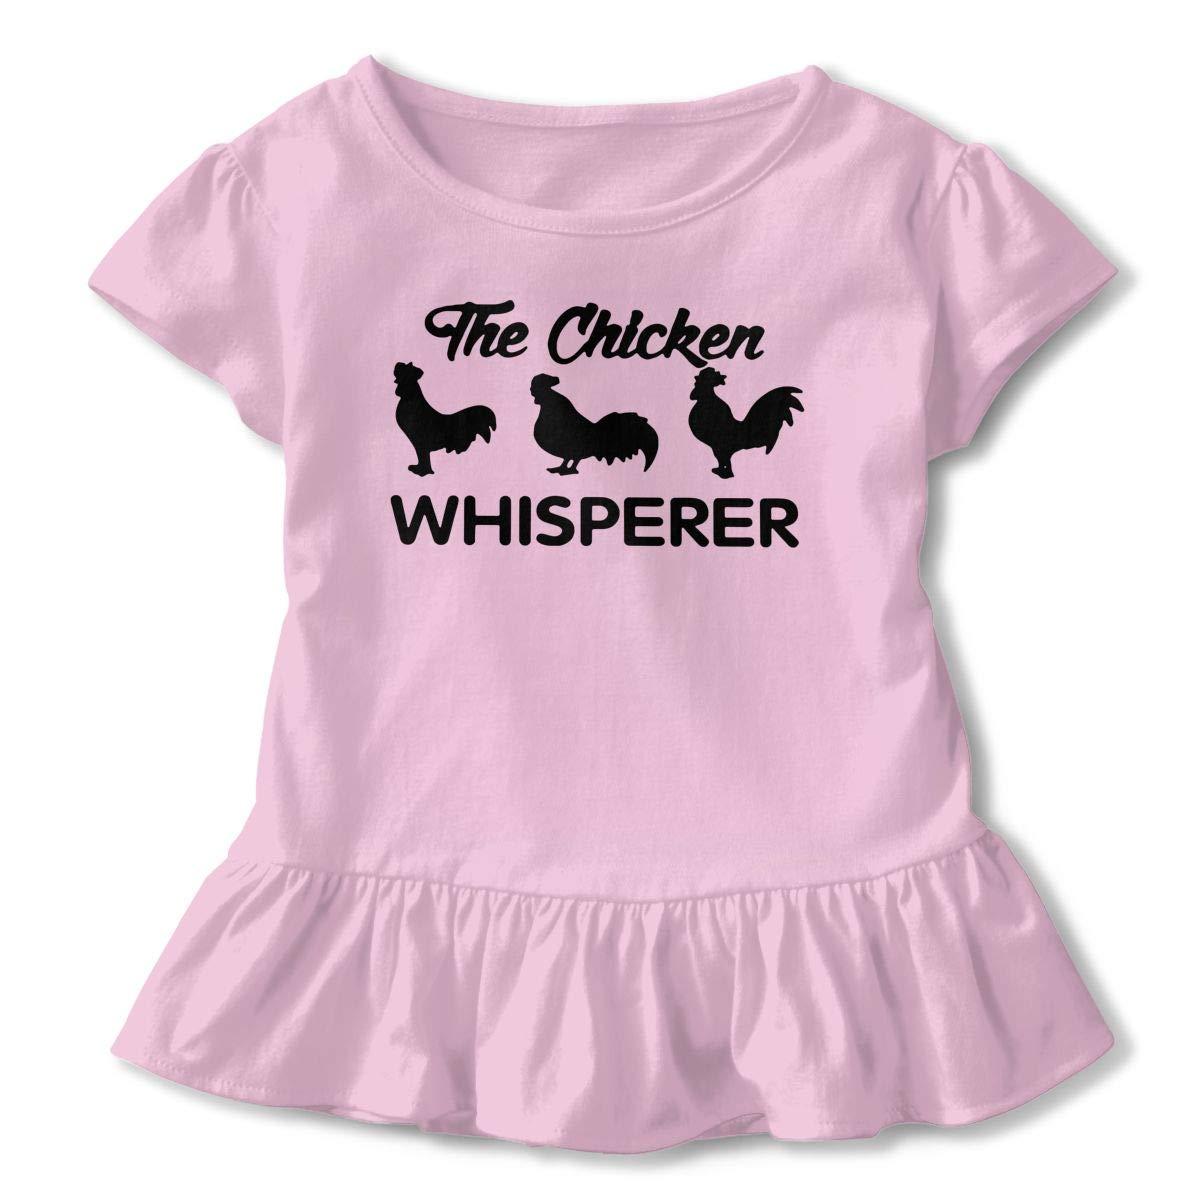 SHIRT1-KIDS The Chicken Whisperer Childrens Girls Short Sleeve Ruffles Shirt Tee for 2-6 Toddlers